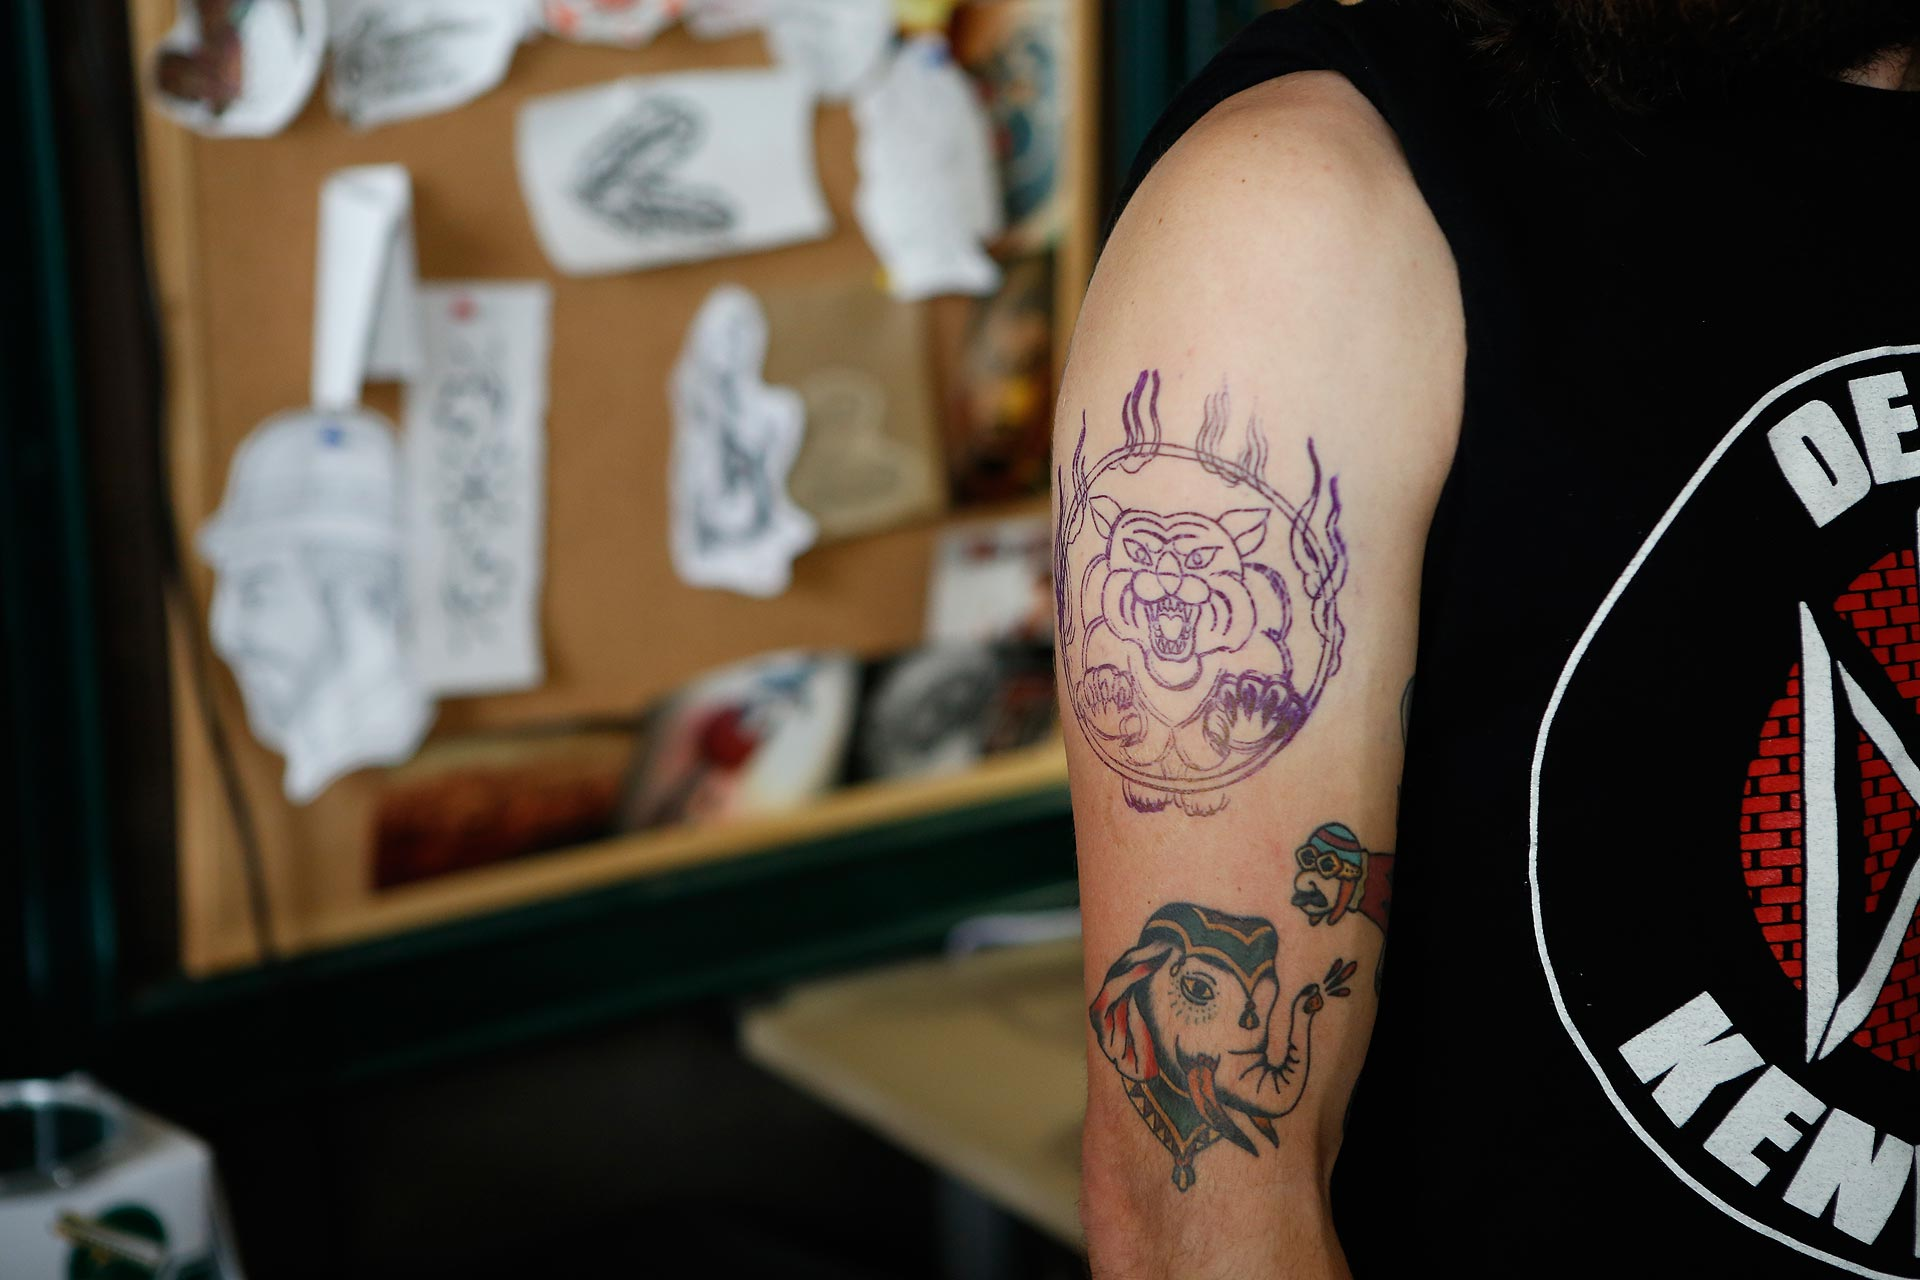 Benjamin Kopf lässt sich im Leipziger Tattoostudio Tattoo-Café am Arm tätowieren.